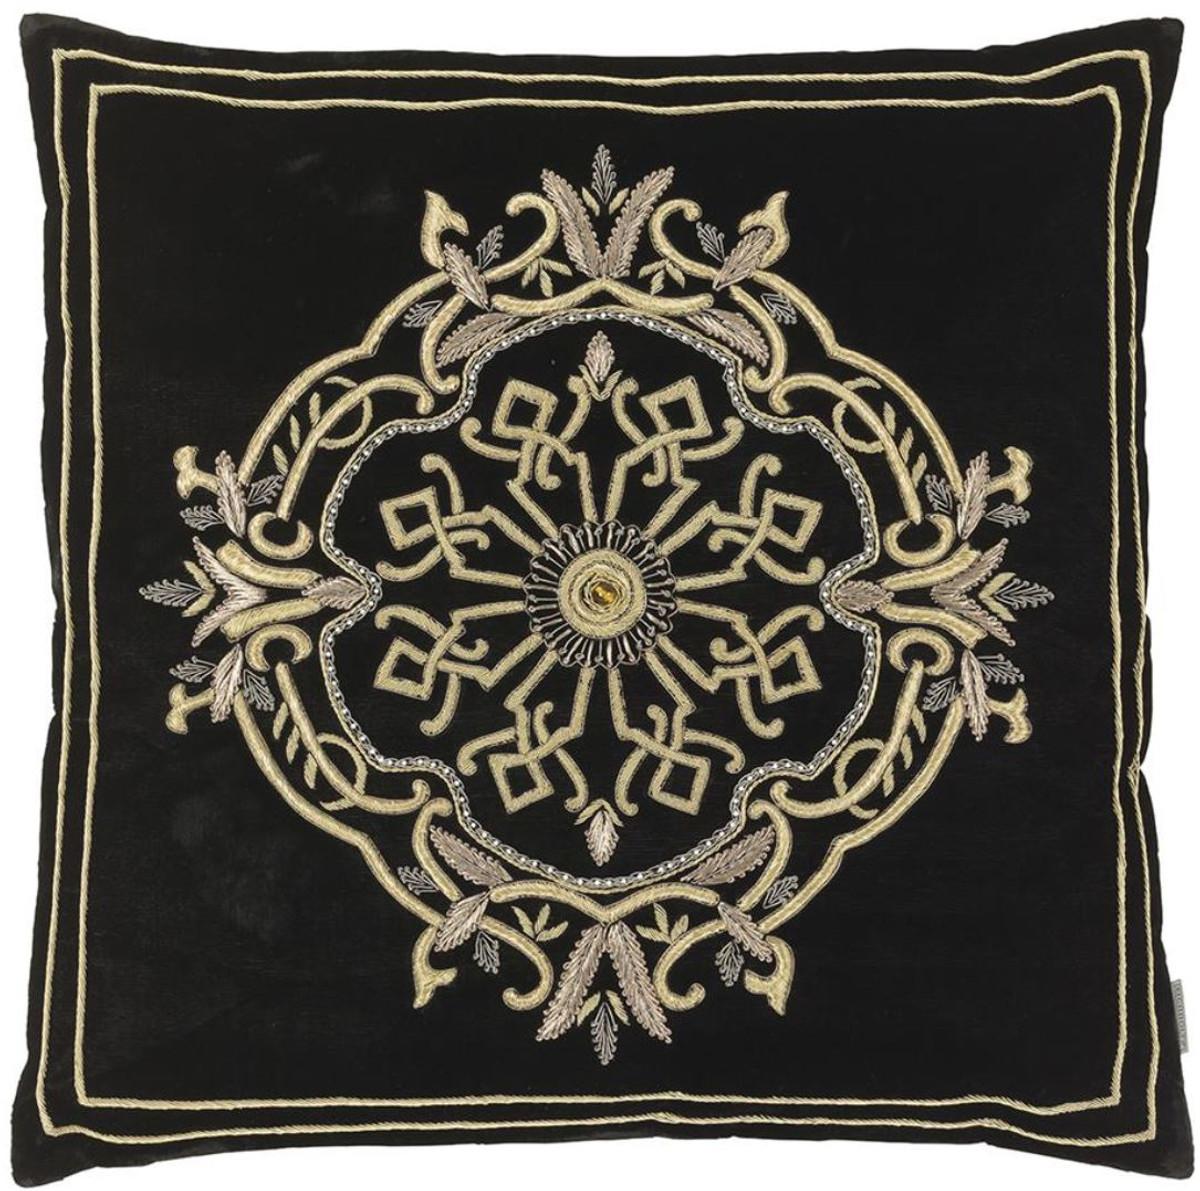 Designer Deko casa padrino designer deko kissen schwarz silber 60 x h 60 cm